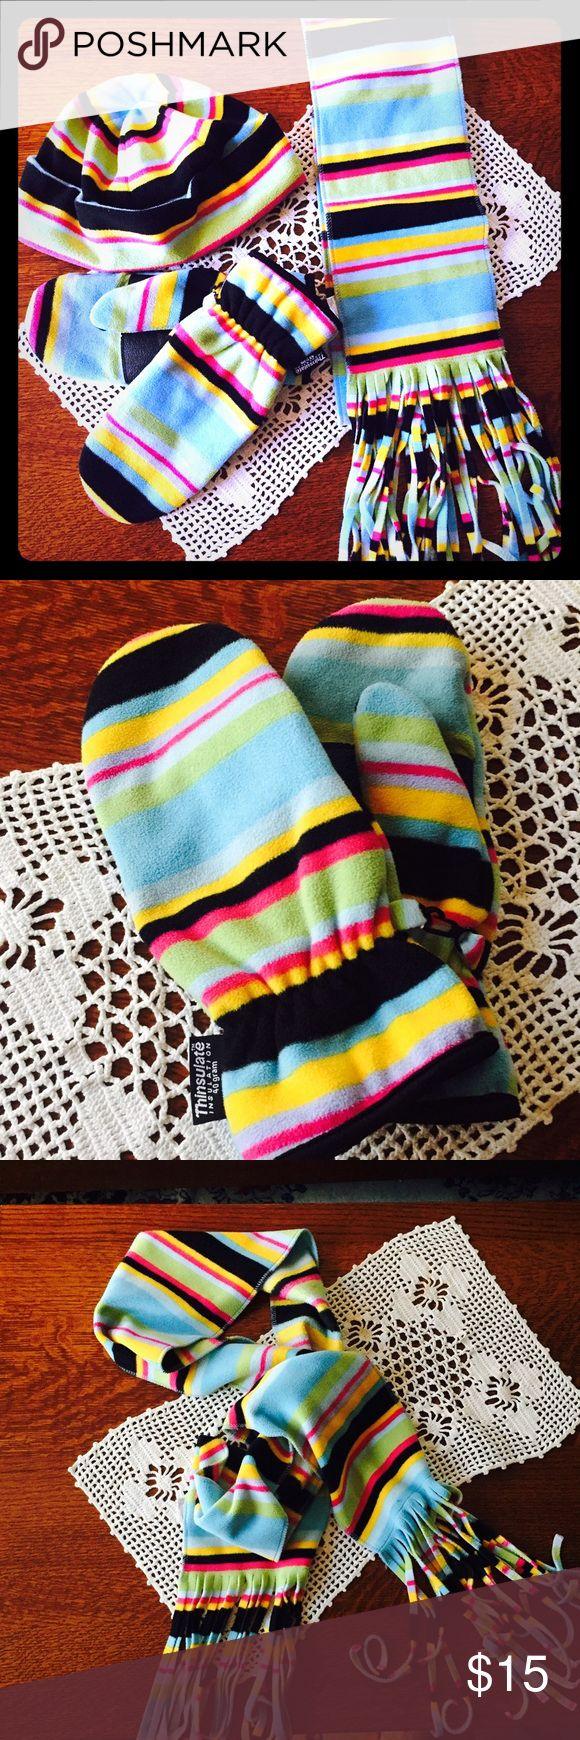 Leather work gloves screwfix - Women S Fleece Hat Scarf Mitten Set Cute Fleece Set Ideal For Those Cold Days